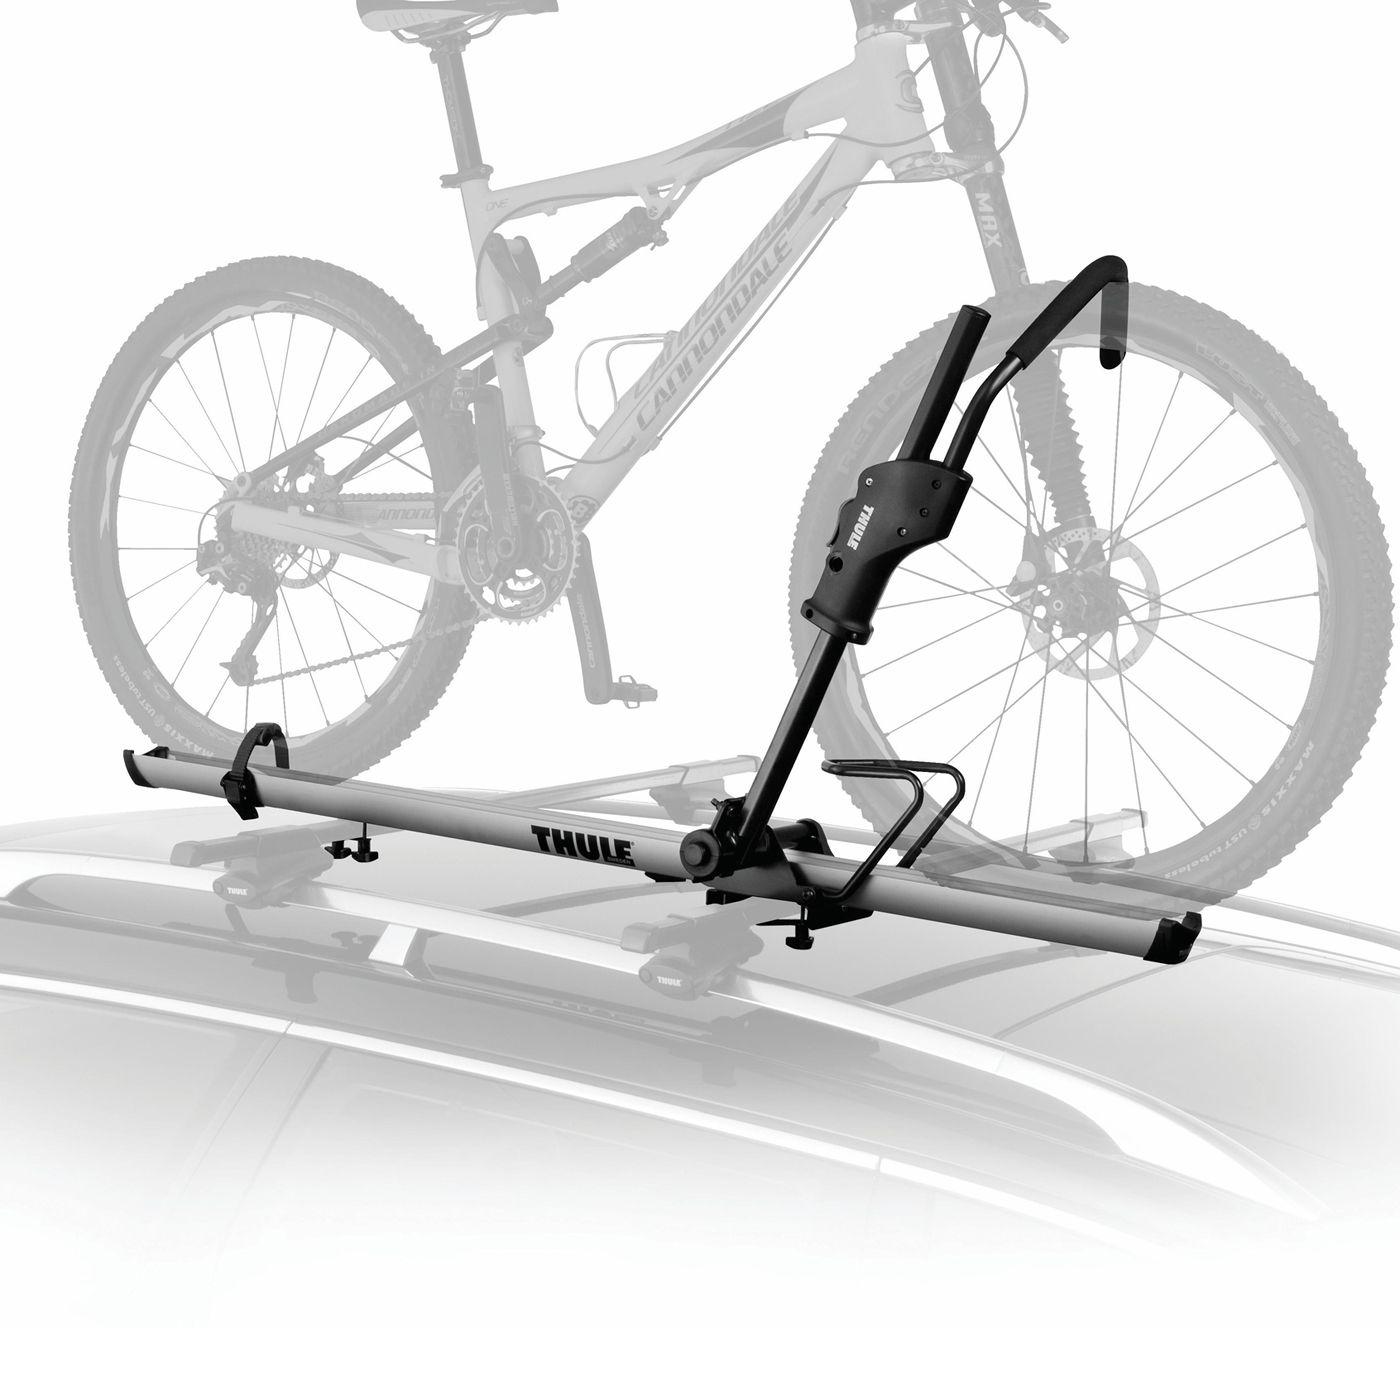 Bike Racks Bike Carriers Bicycle Rack Roof mount bike